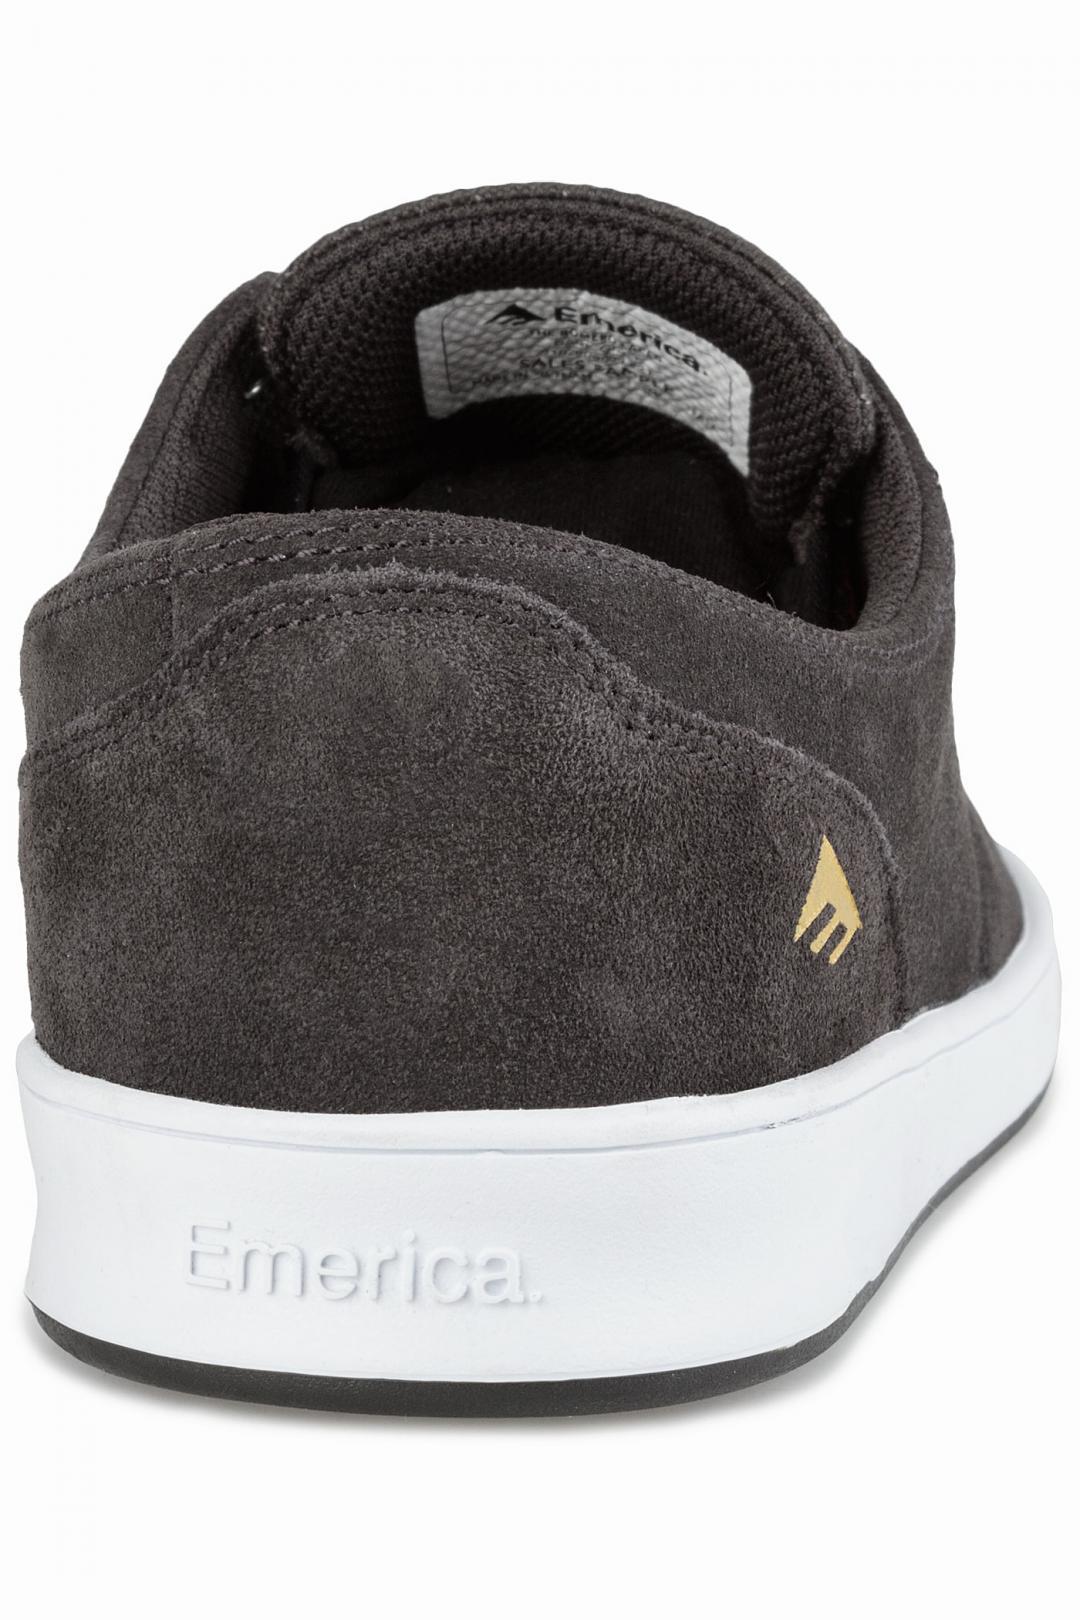 Uomo Emerica The Romero Laced dark grey | Sneakers low top